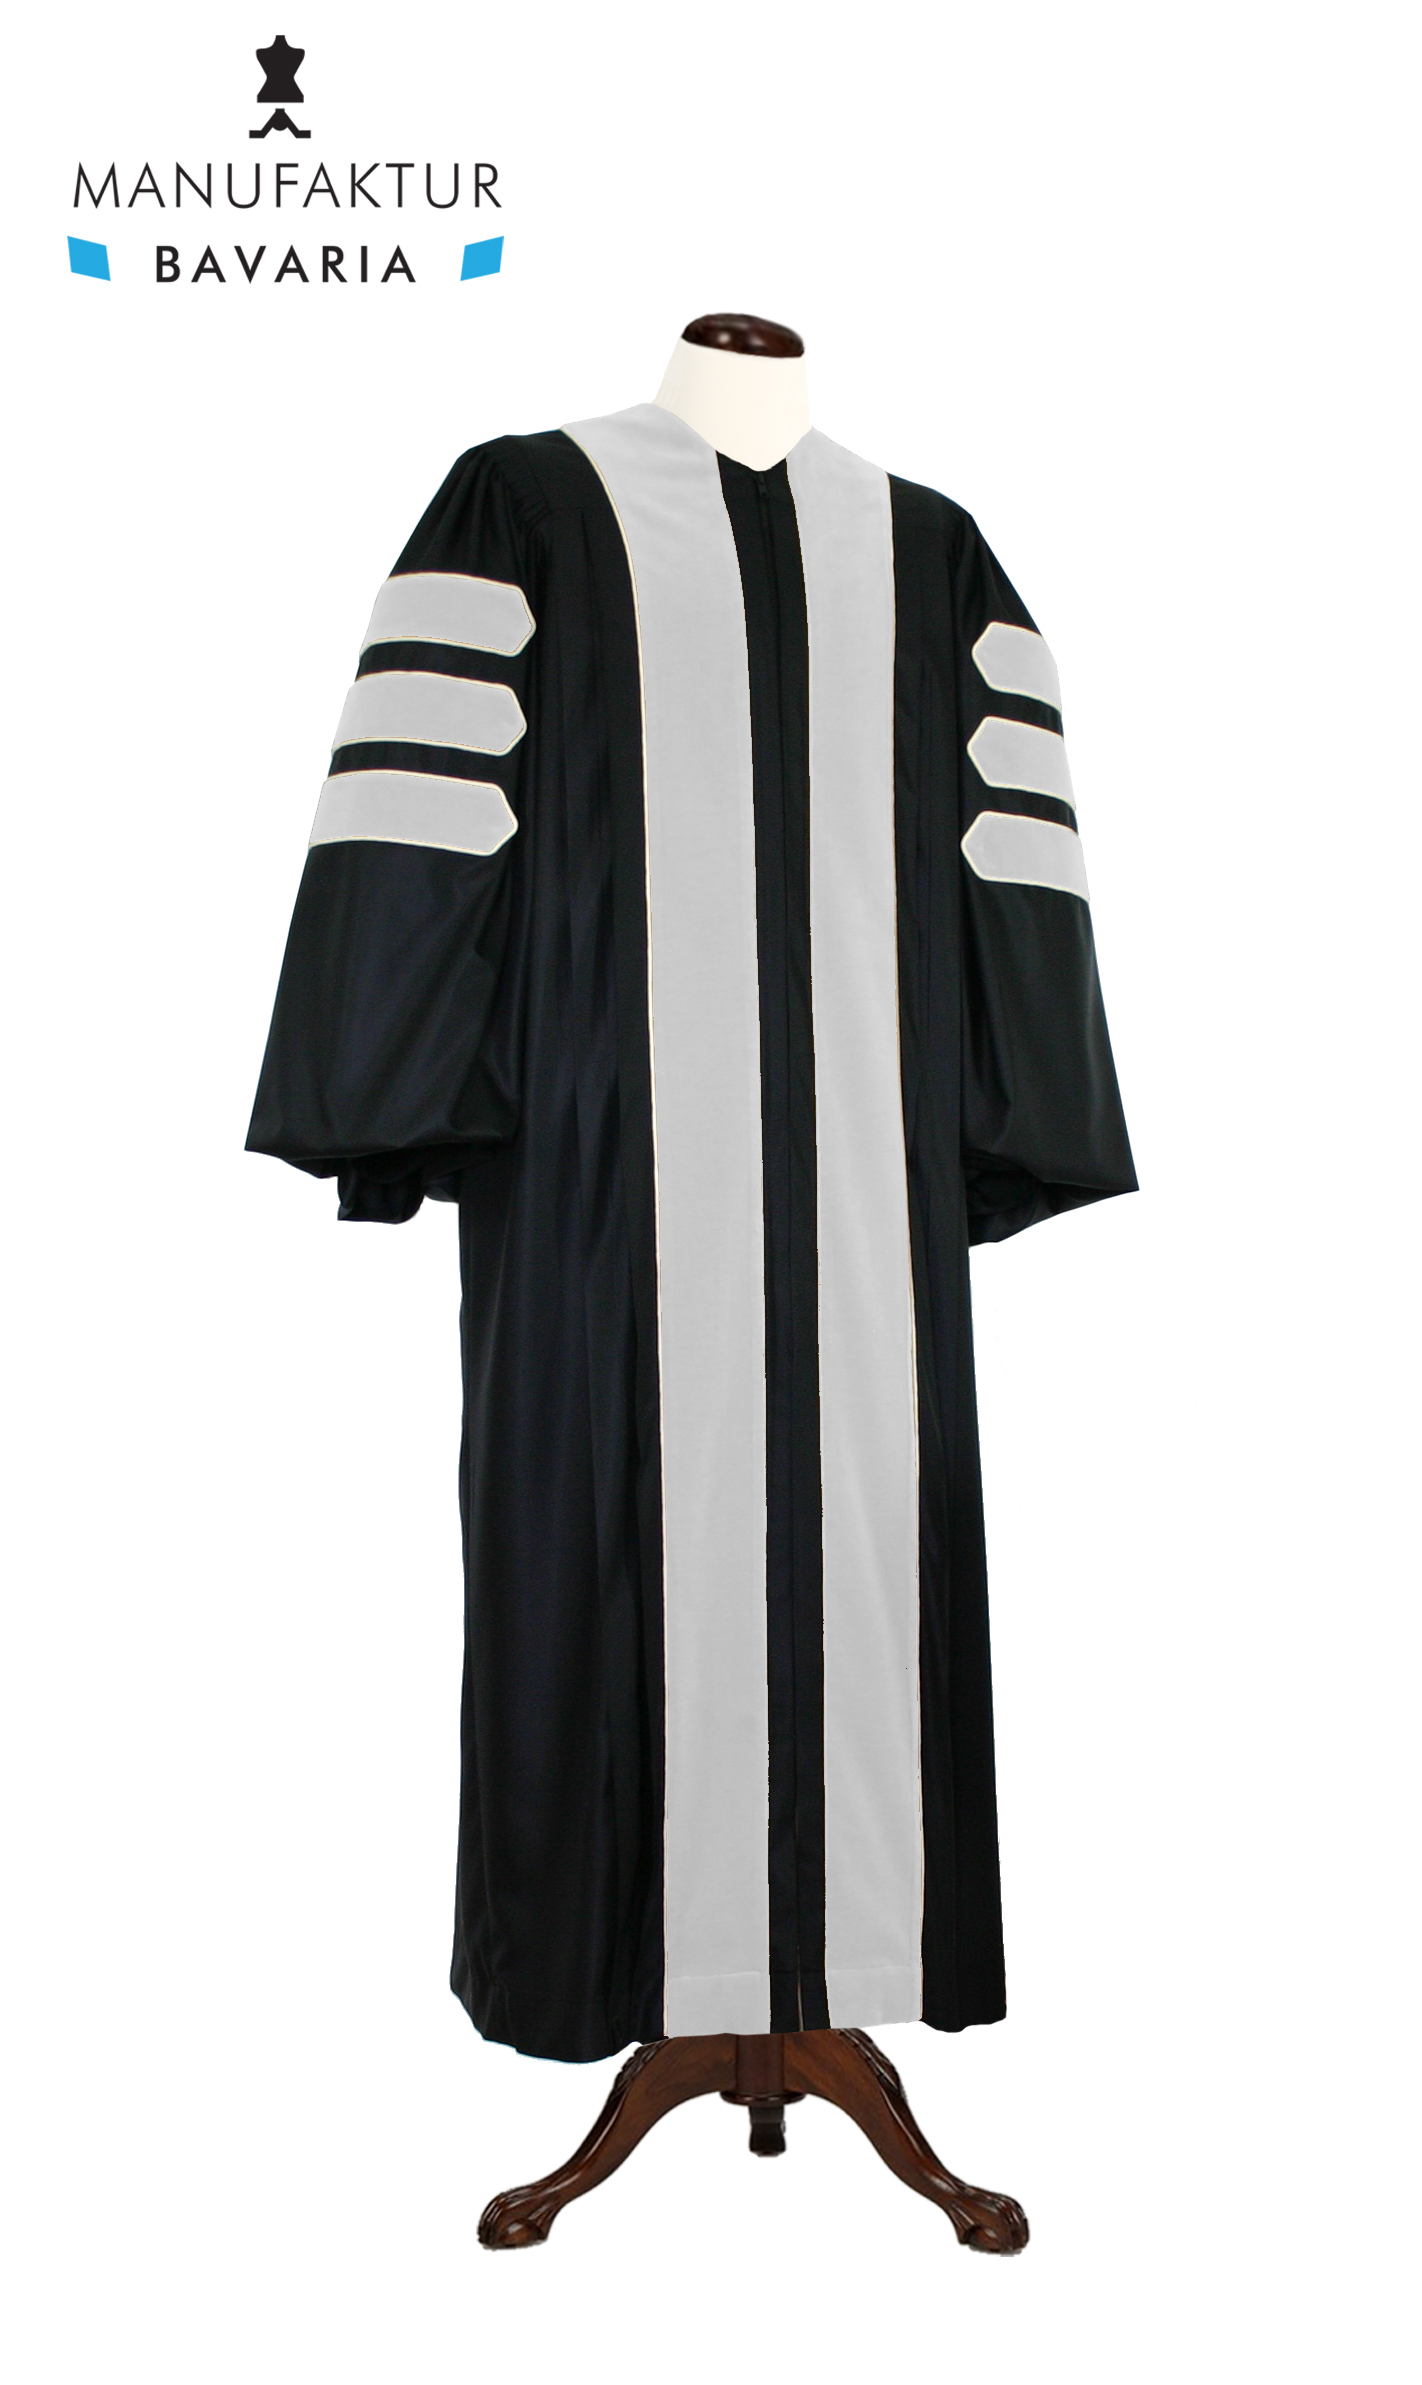 Doktortalar Kunst und Geisteswissenschaften - royal regalia